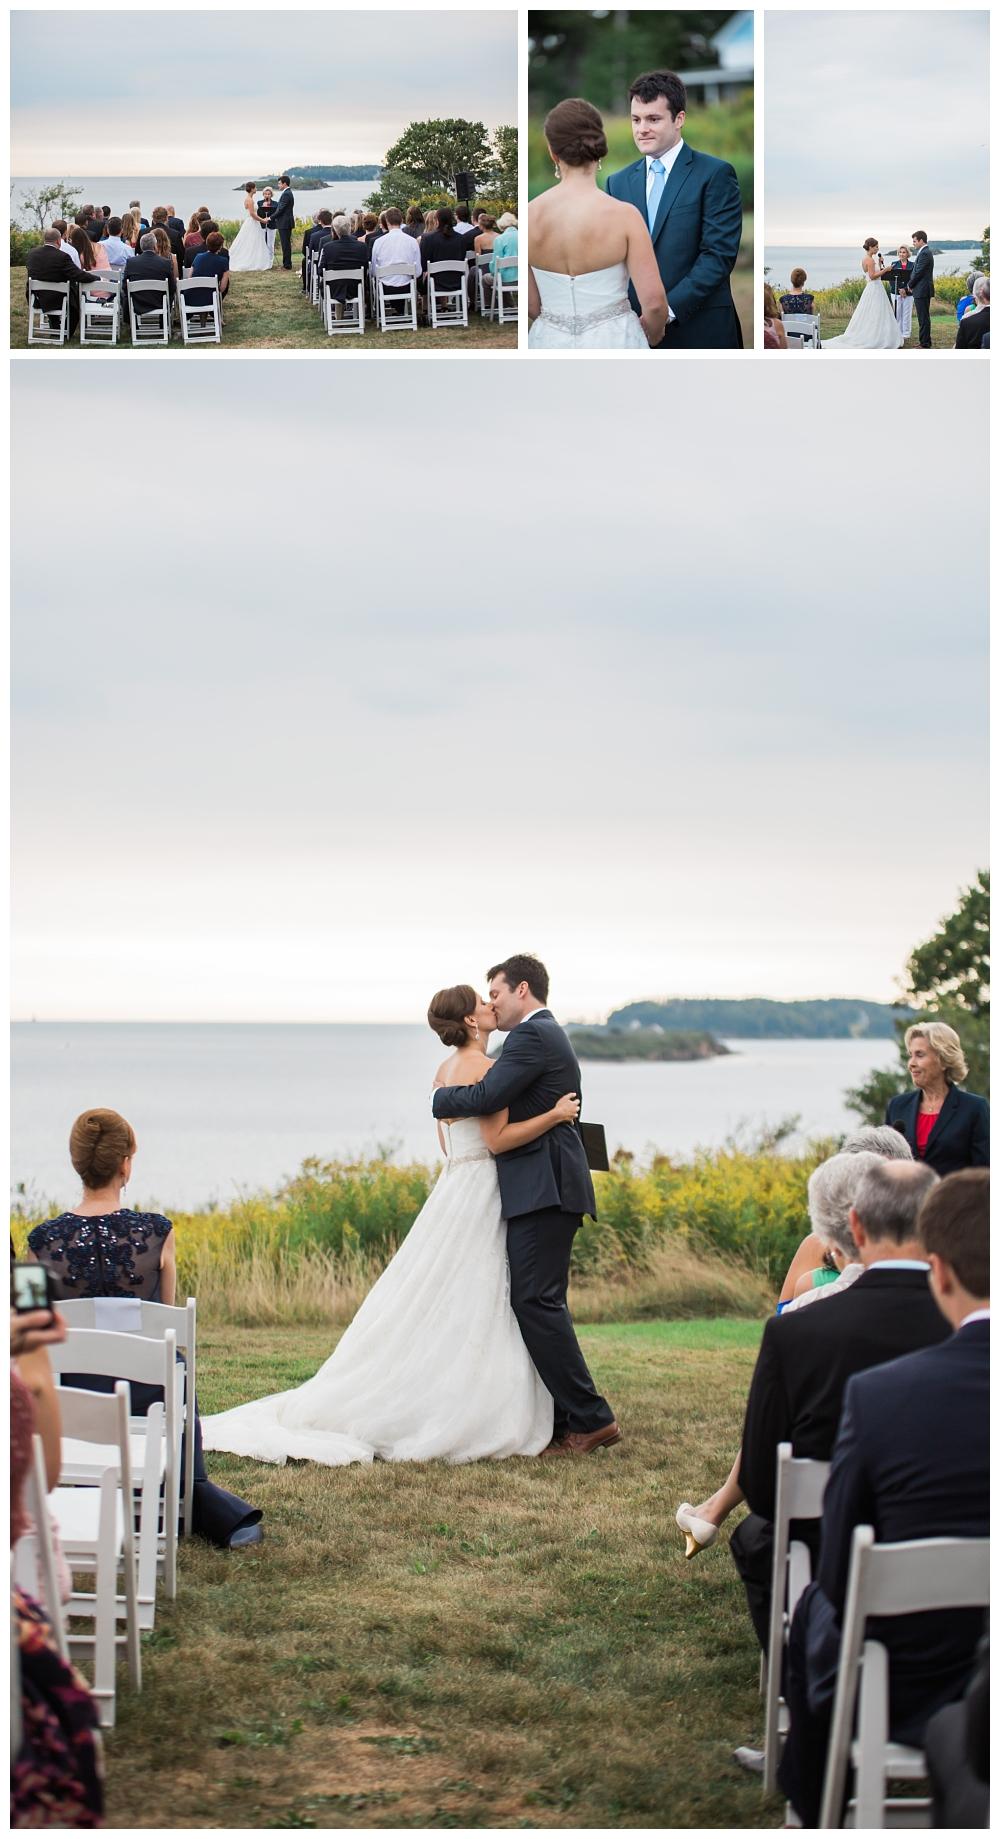 Maine Wedding Photographer Harpswell Ceremony I do